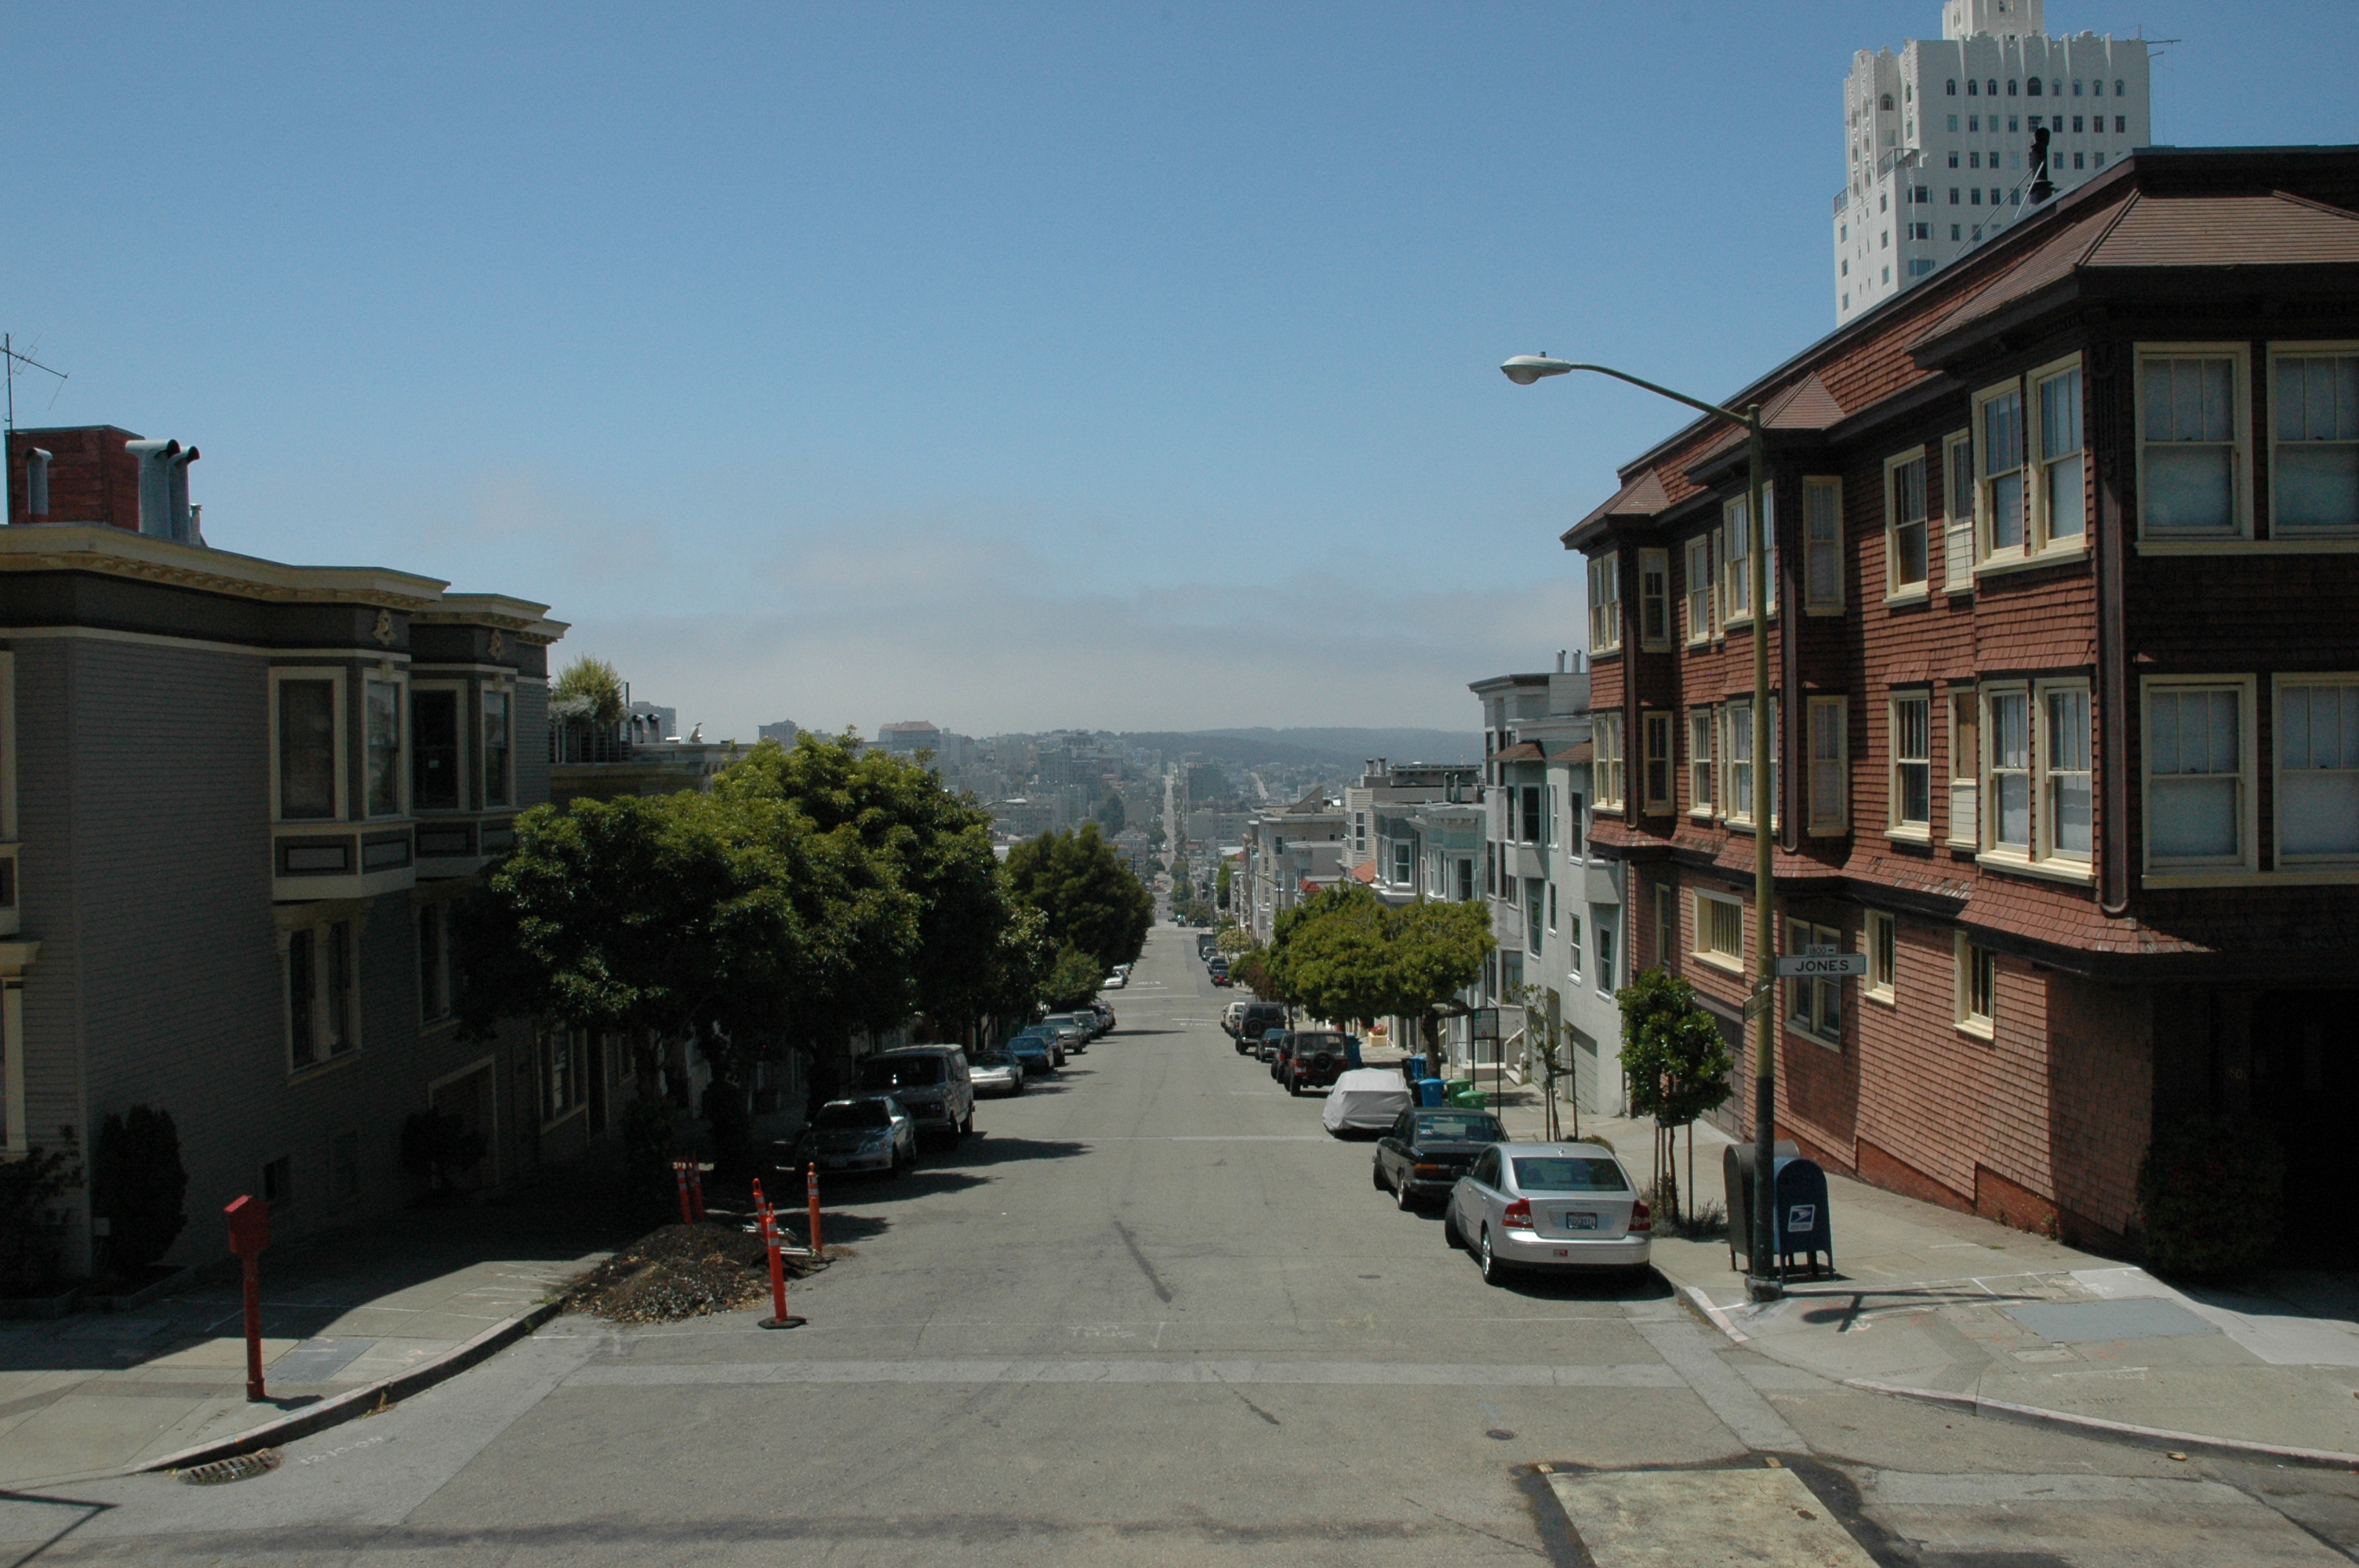 Photowalk in SF